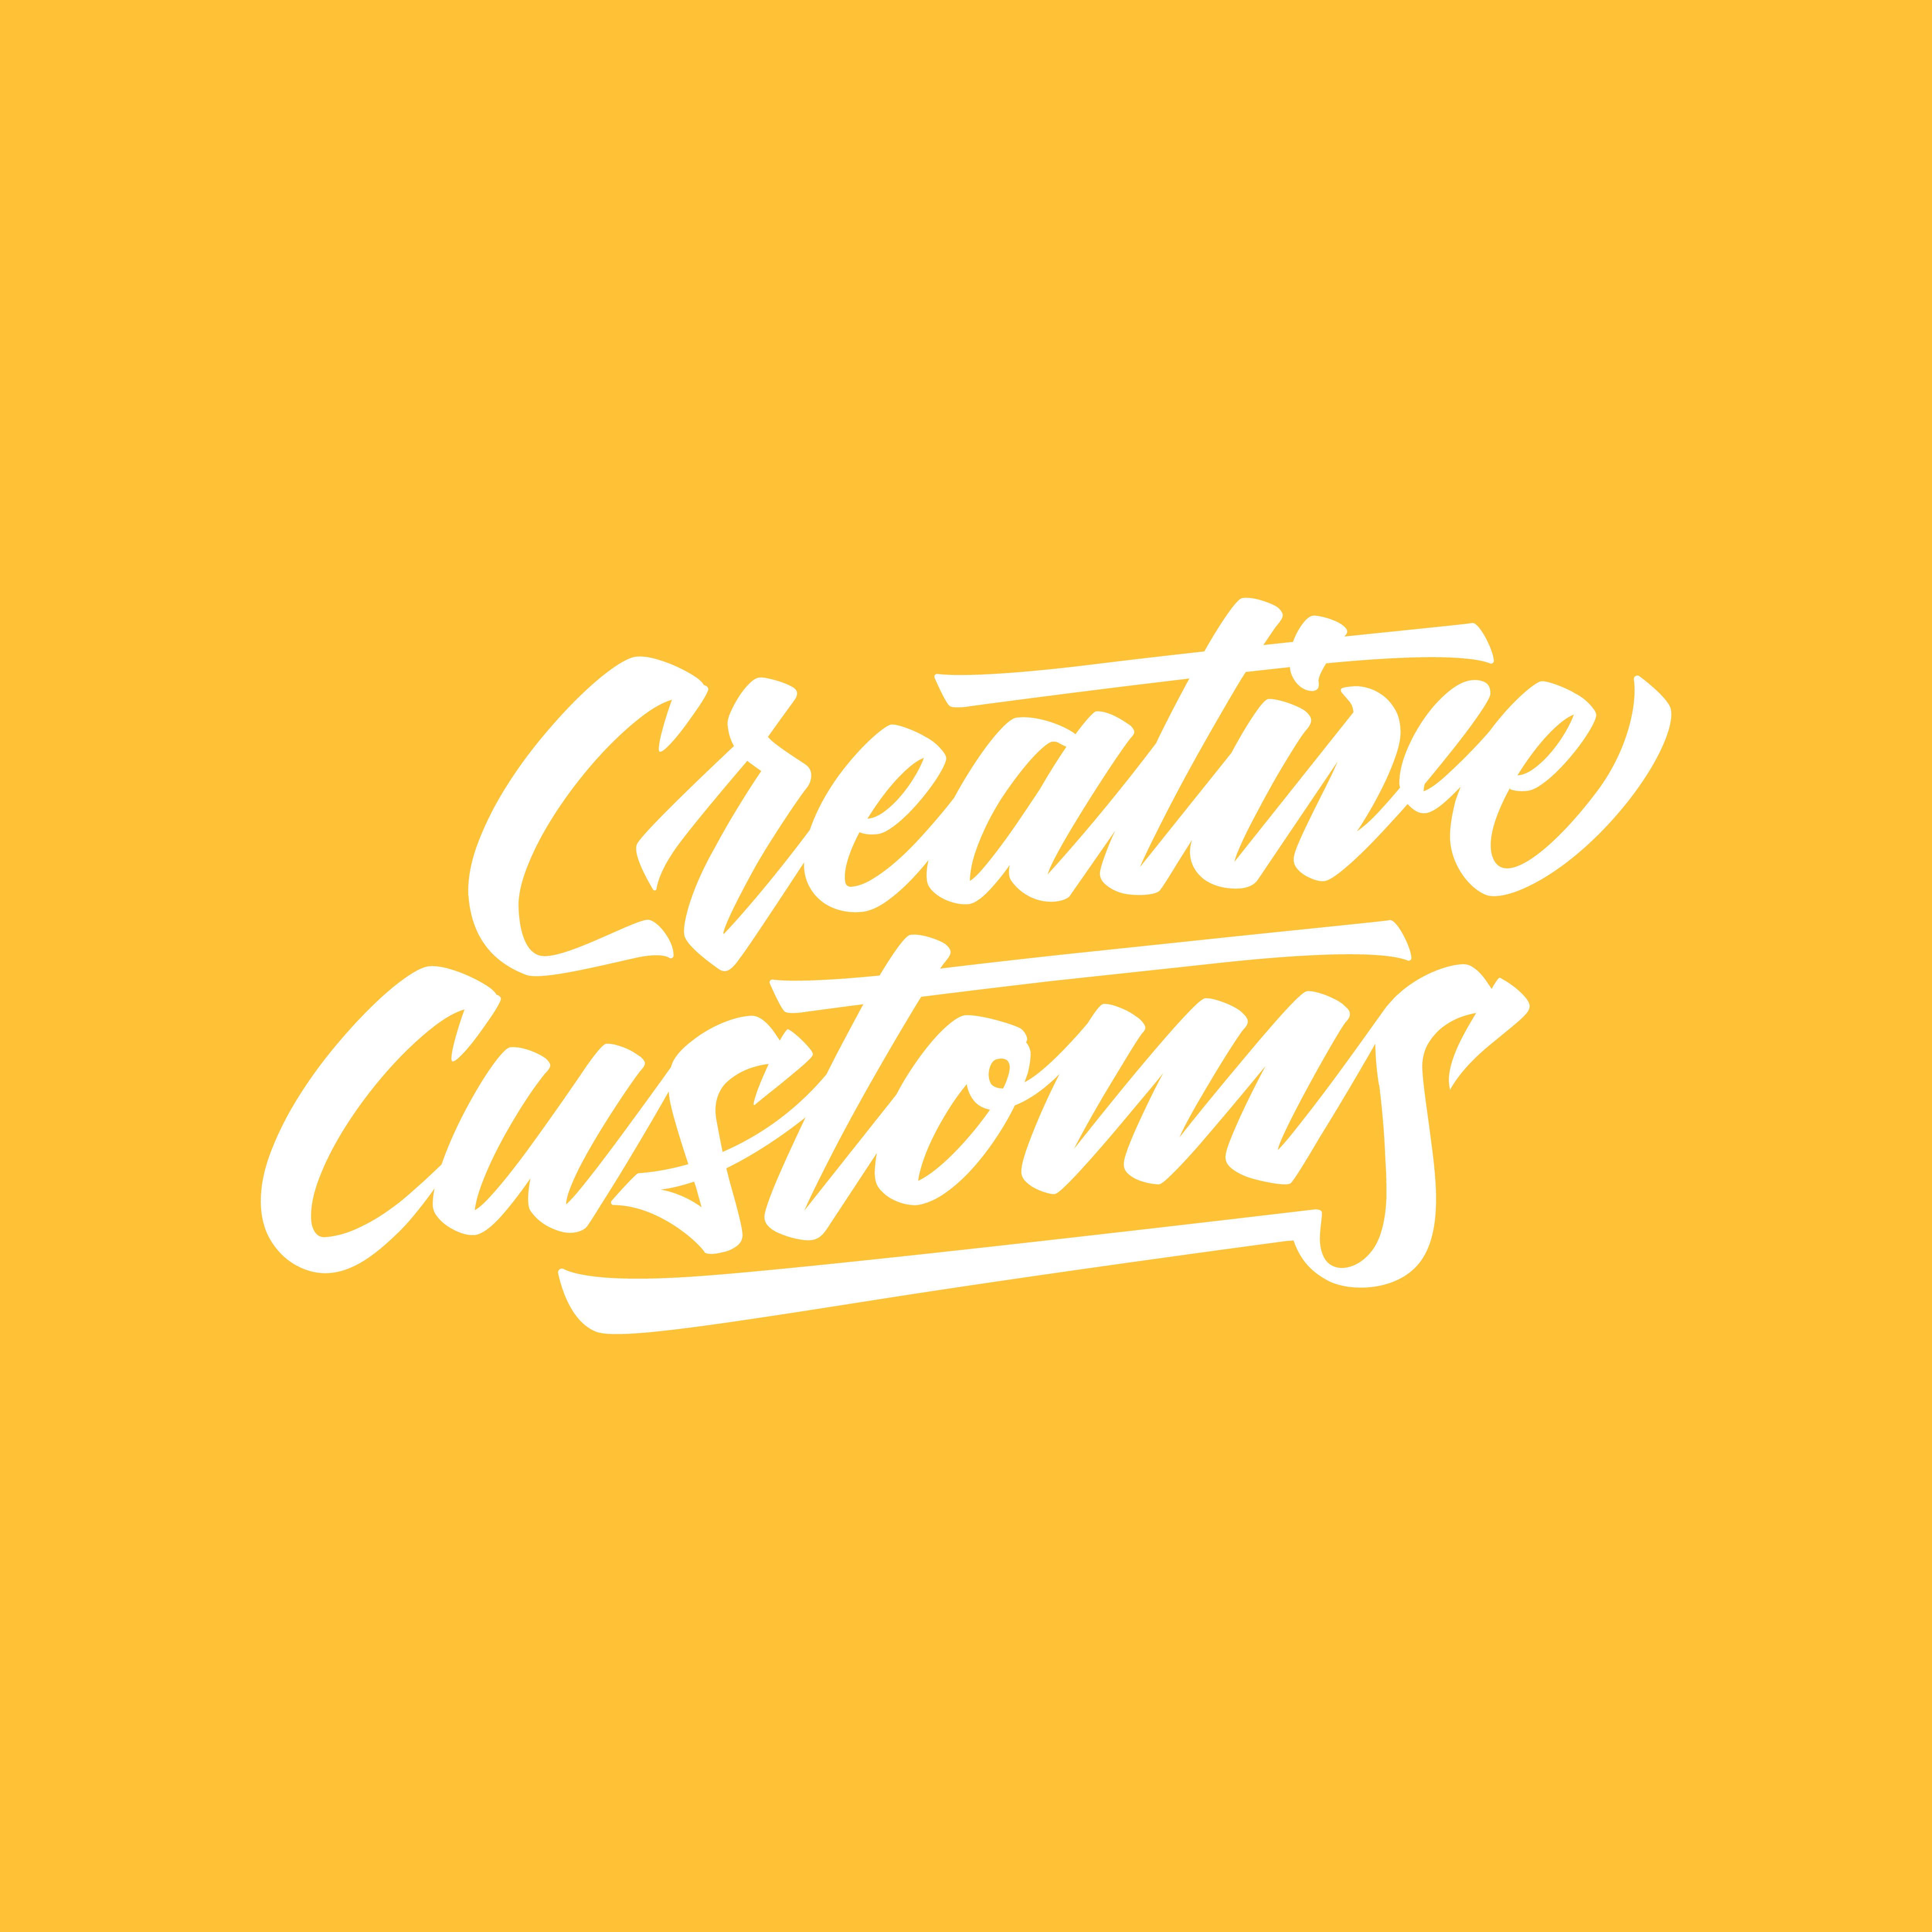 Creative Customs